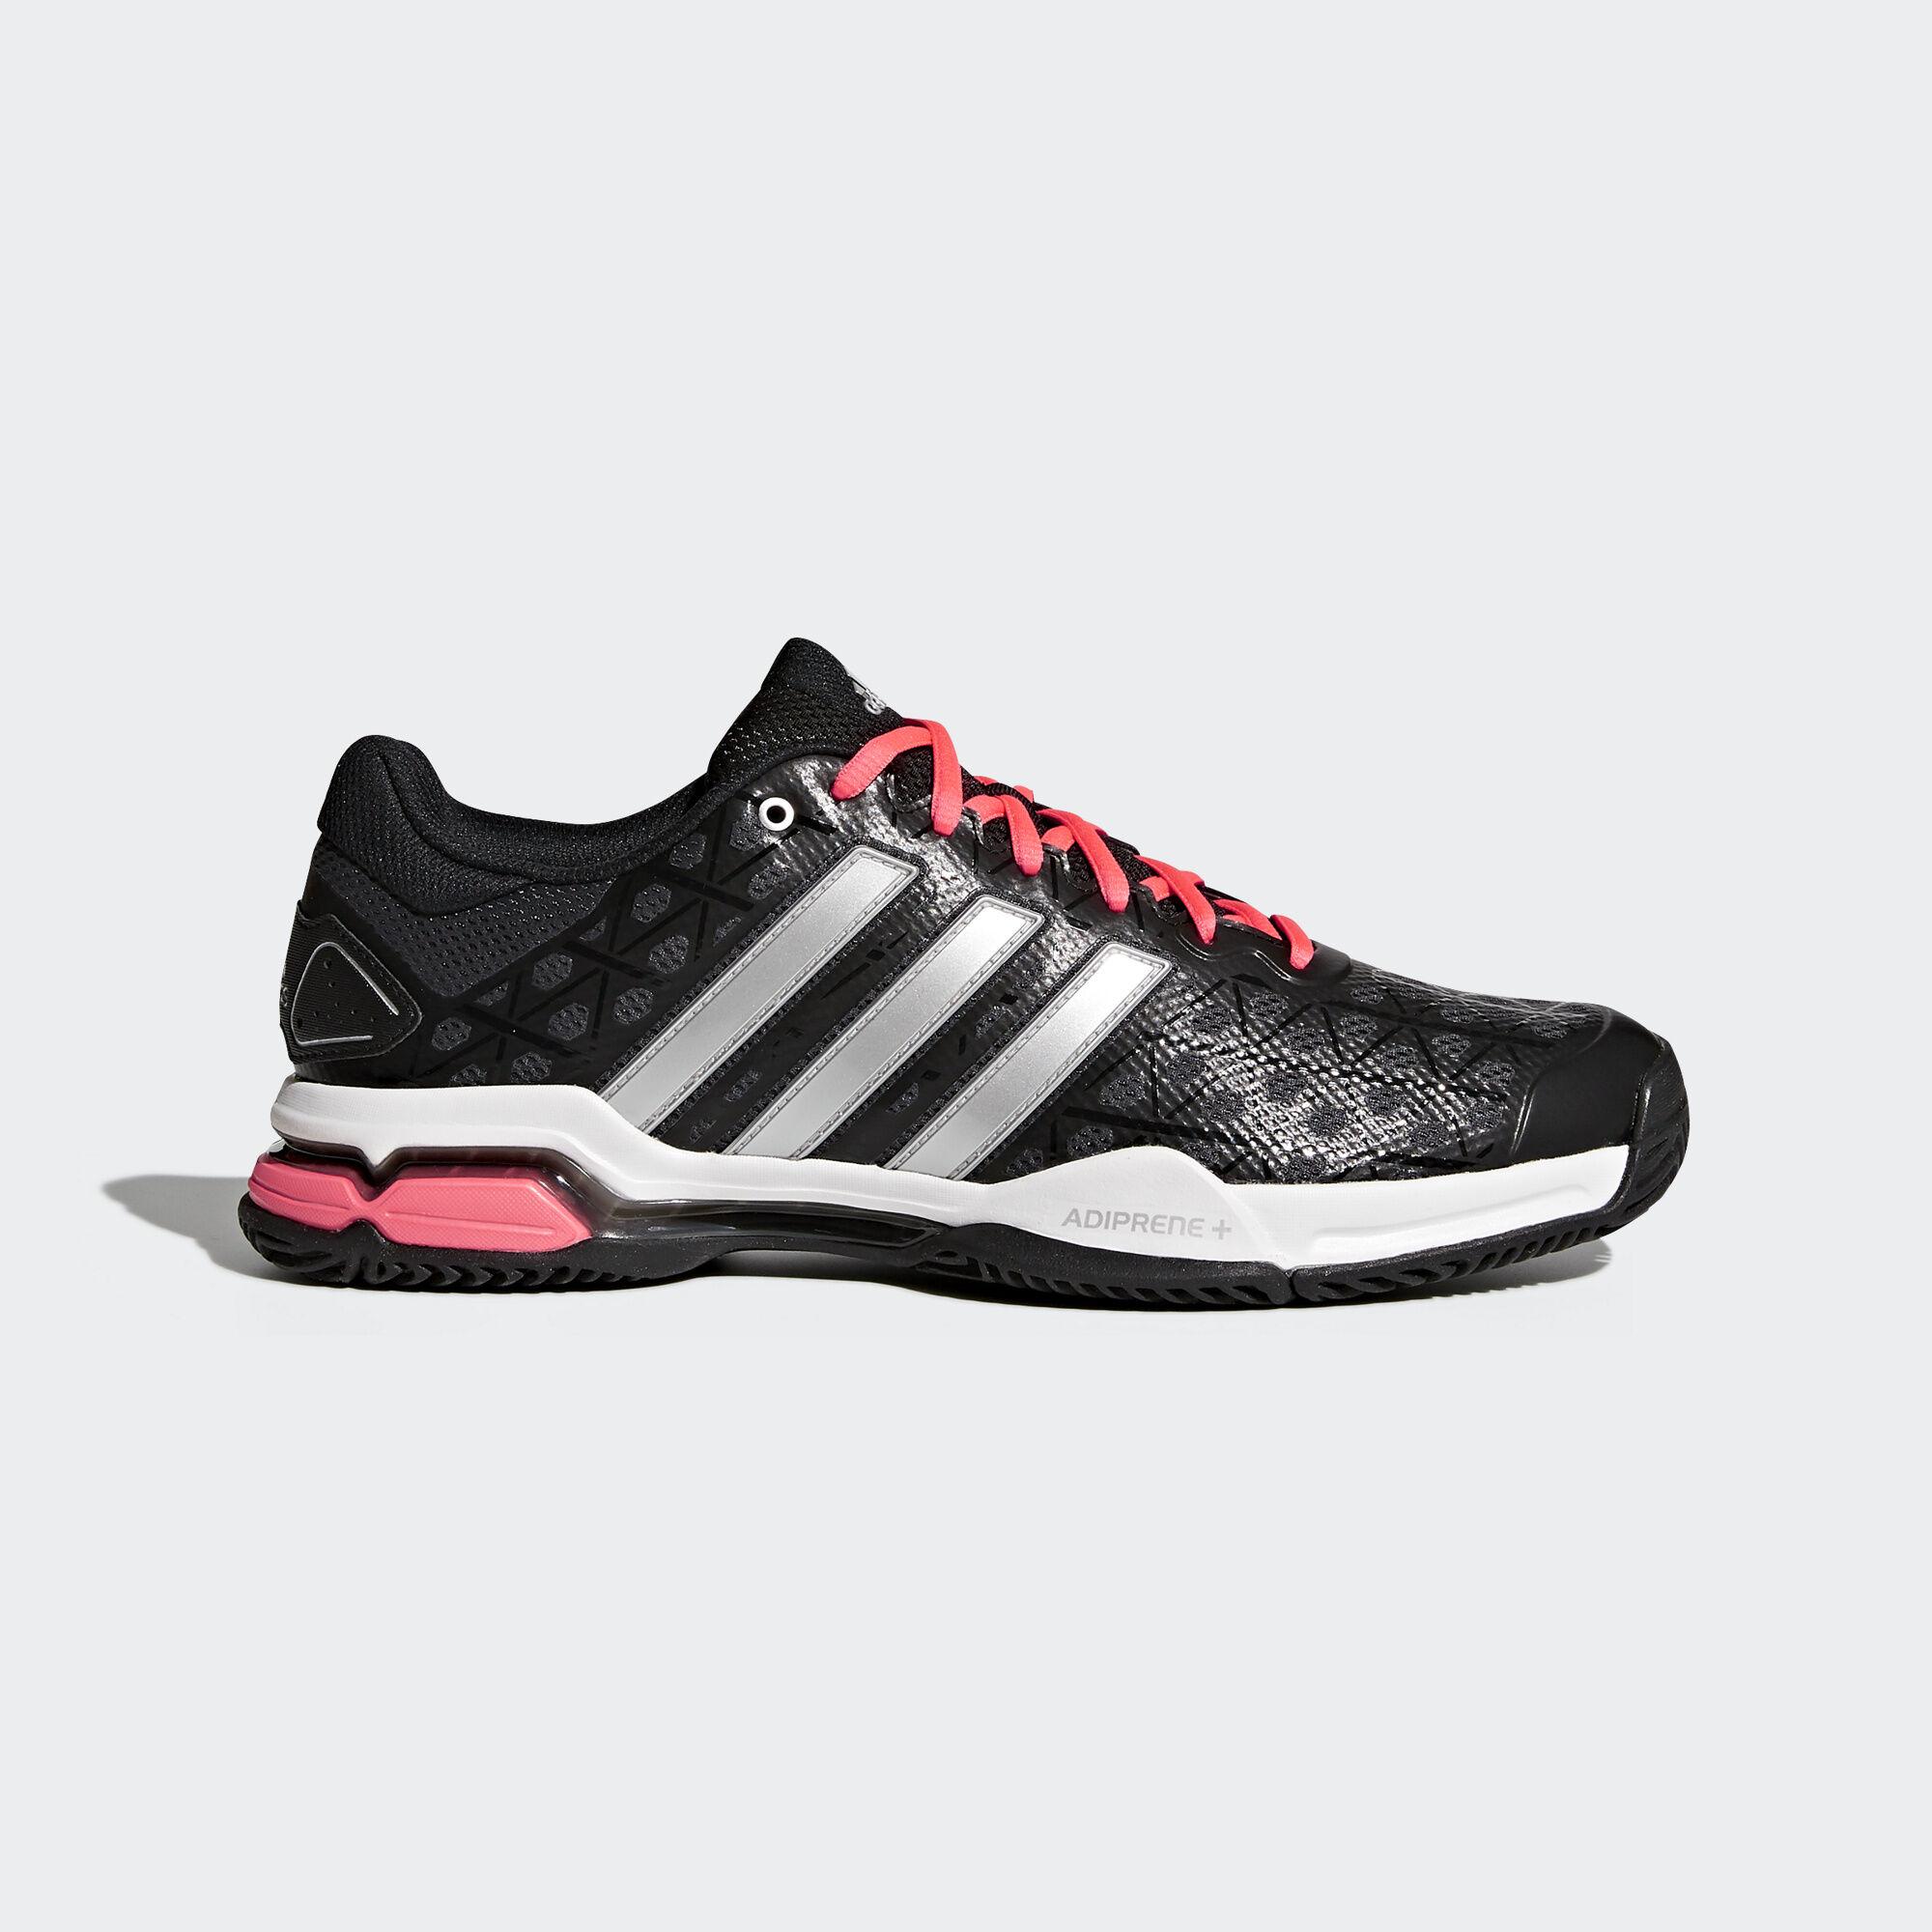 adidas Barricade Club Shoes Core Black Metallic Silver Flash Red AQ2288